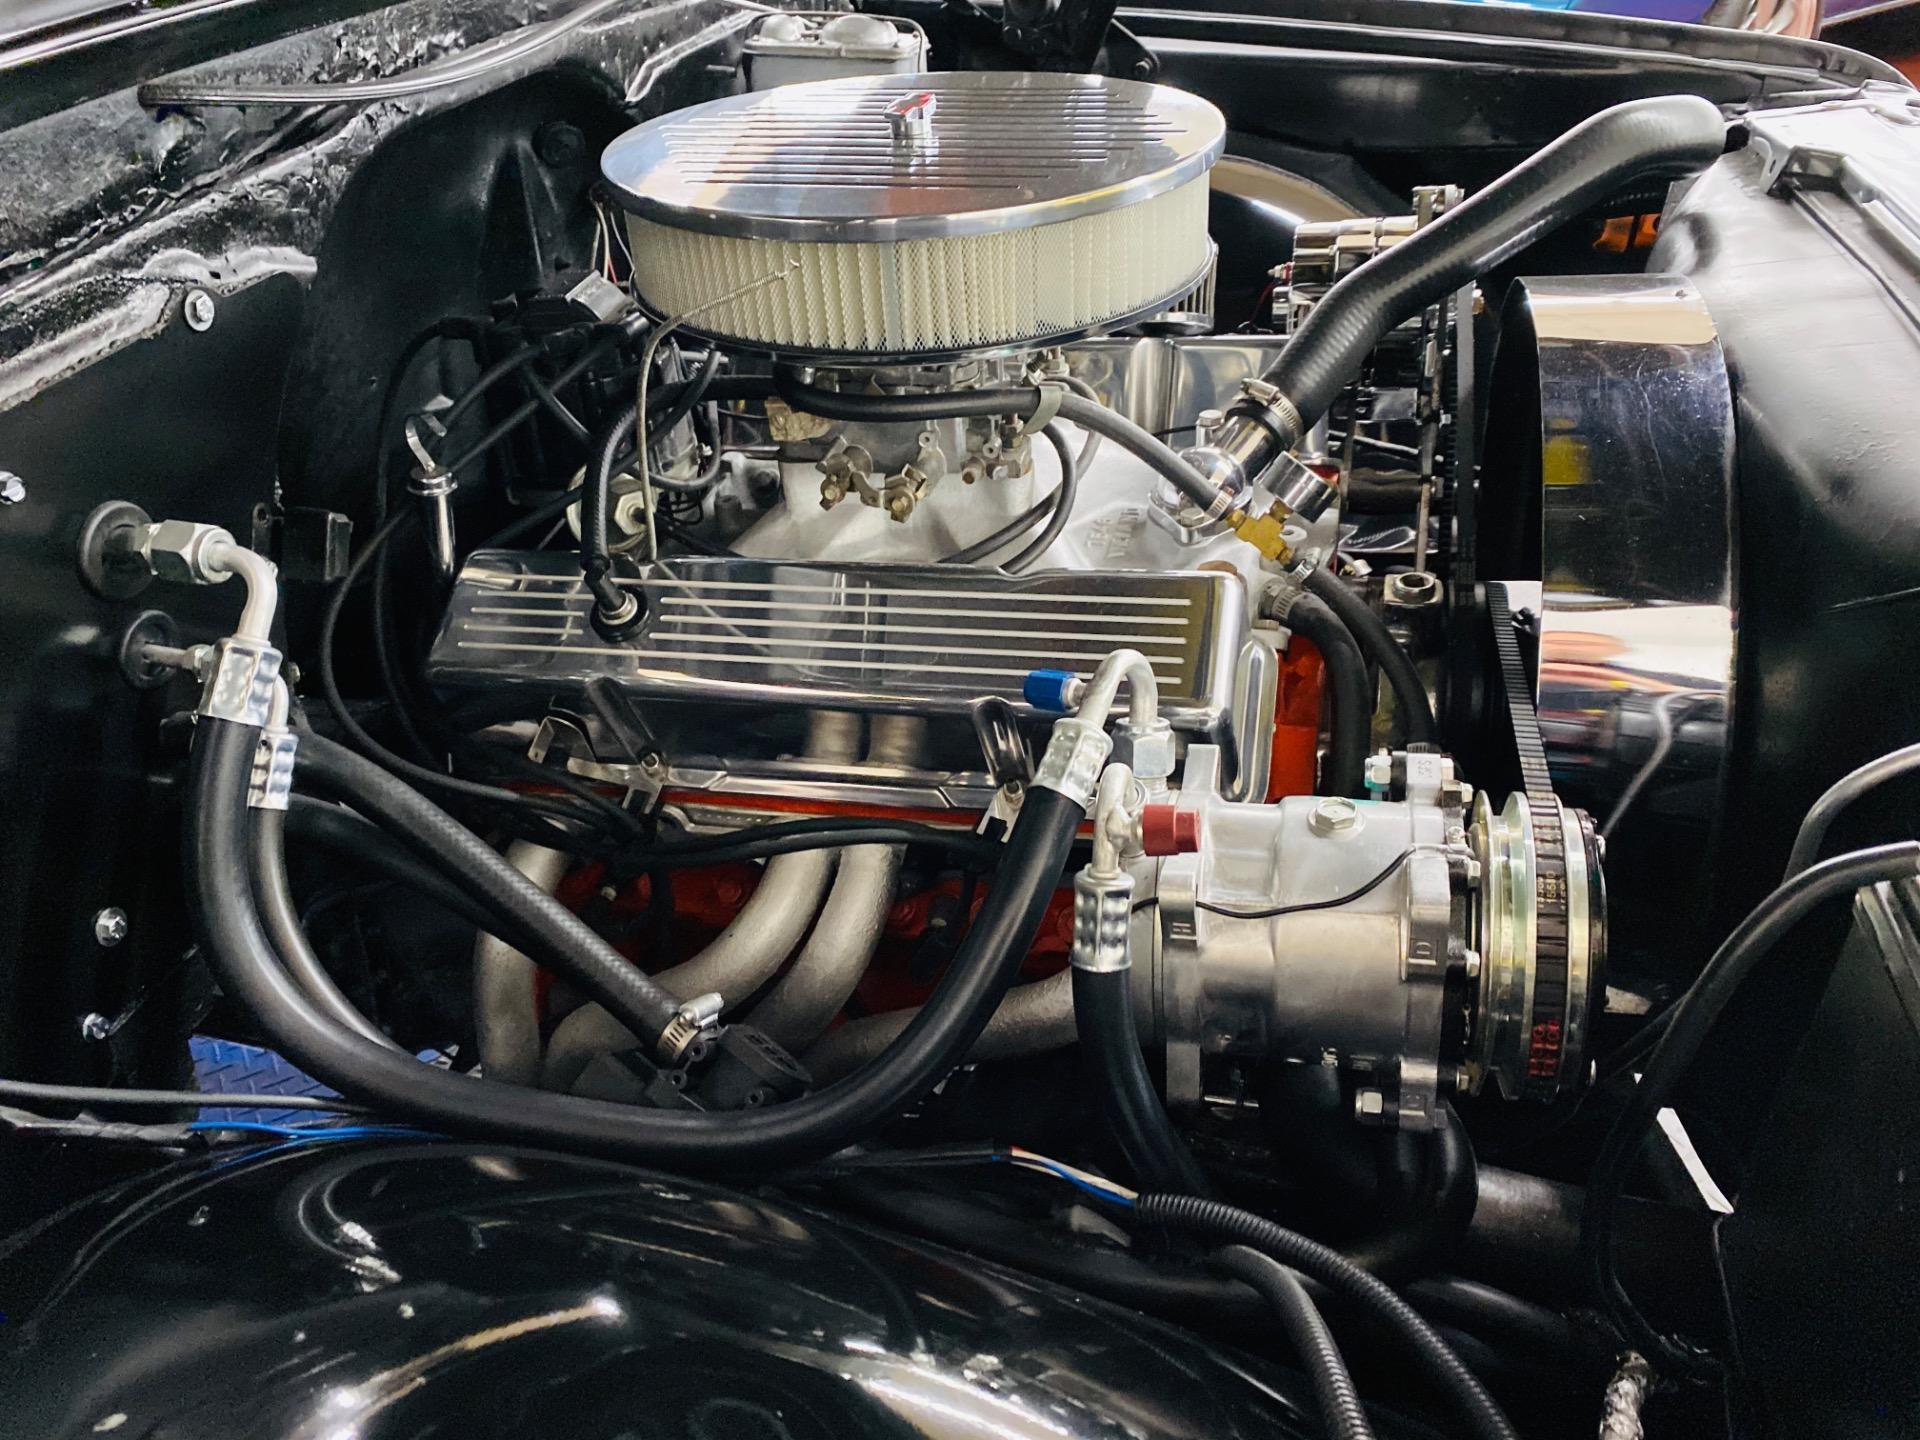 Used 1970 Chevrolet Pickup - C 10 - CHEYENNE TRIM - CLEAN SOUTHERN TRUCK - | Mundelein, IL